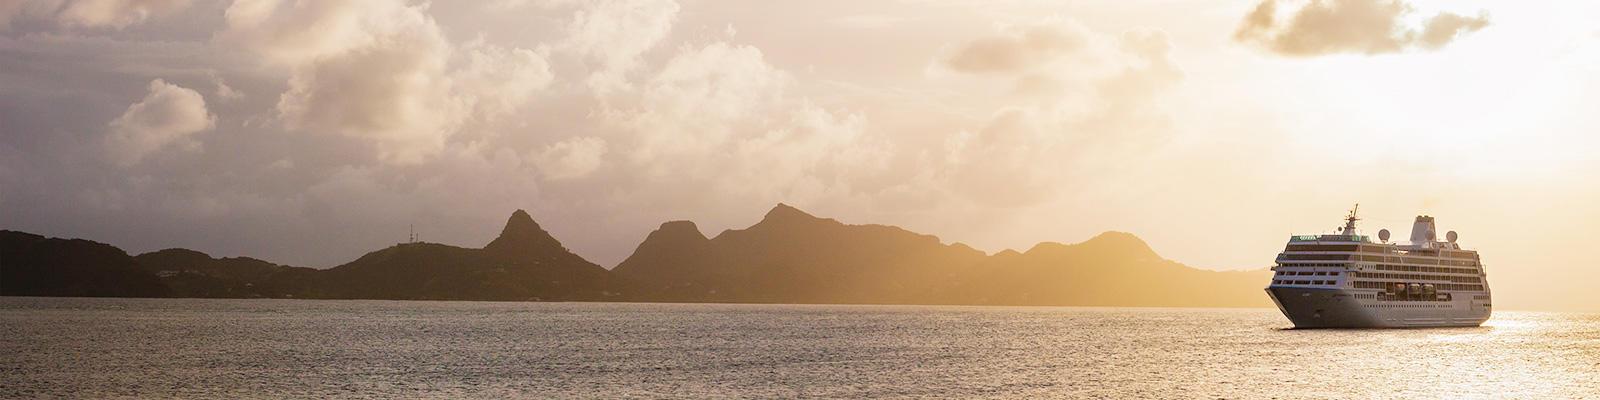 news in ocean cruise 2019-2020